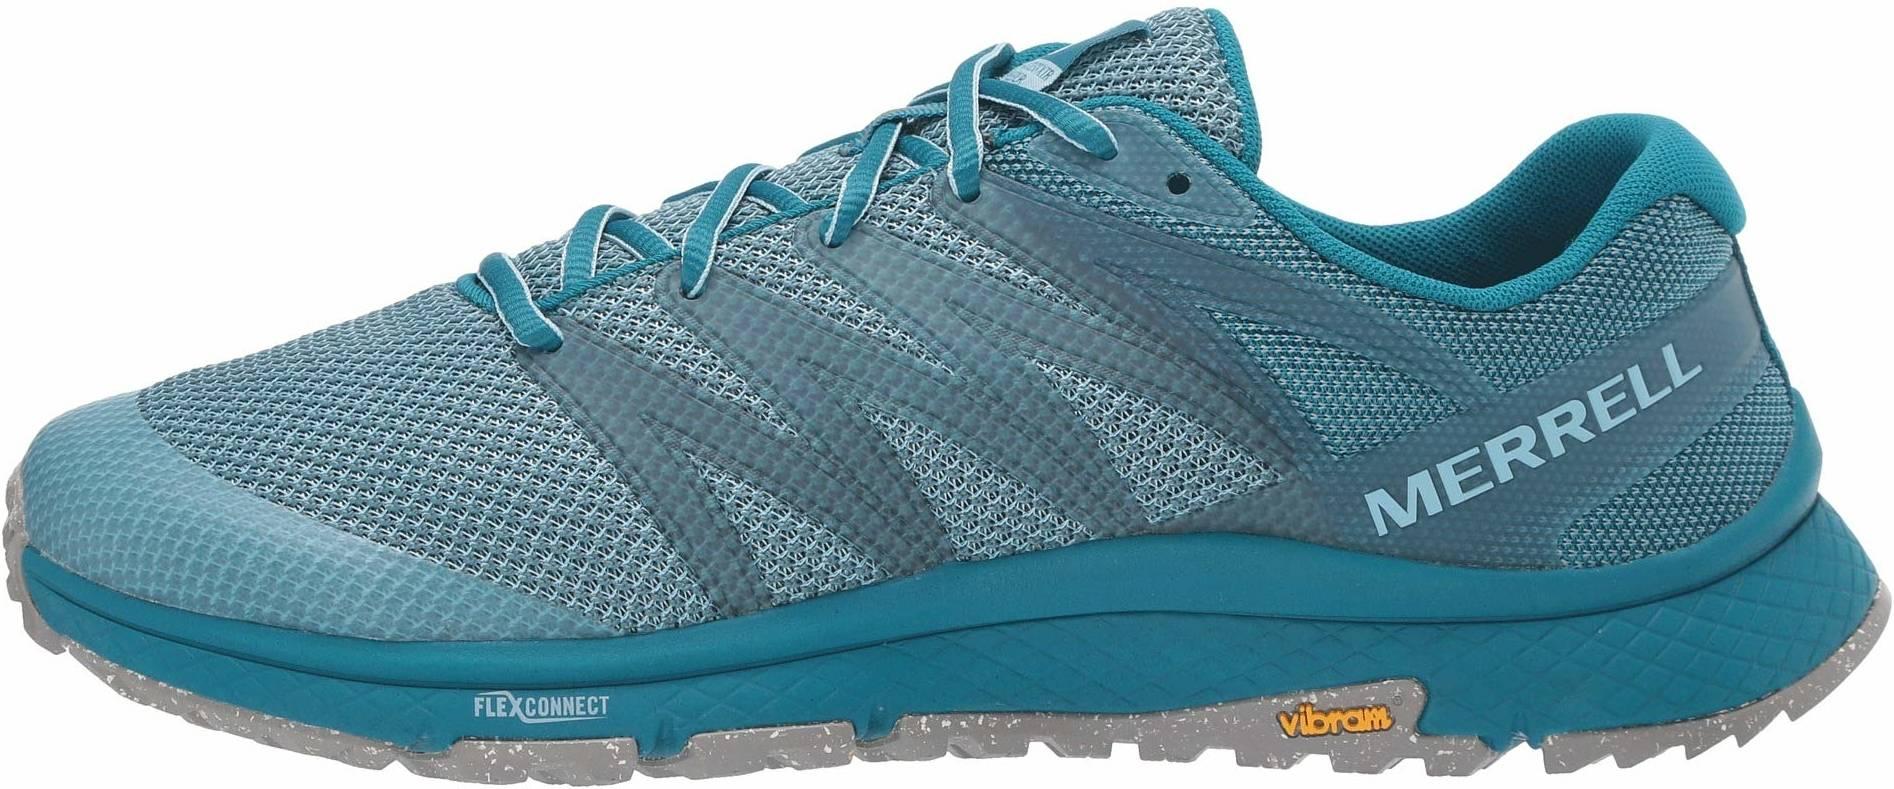 Merrell Womens Bare Access XTR Trail Running Shoes